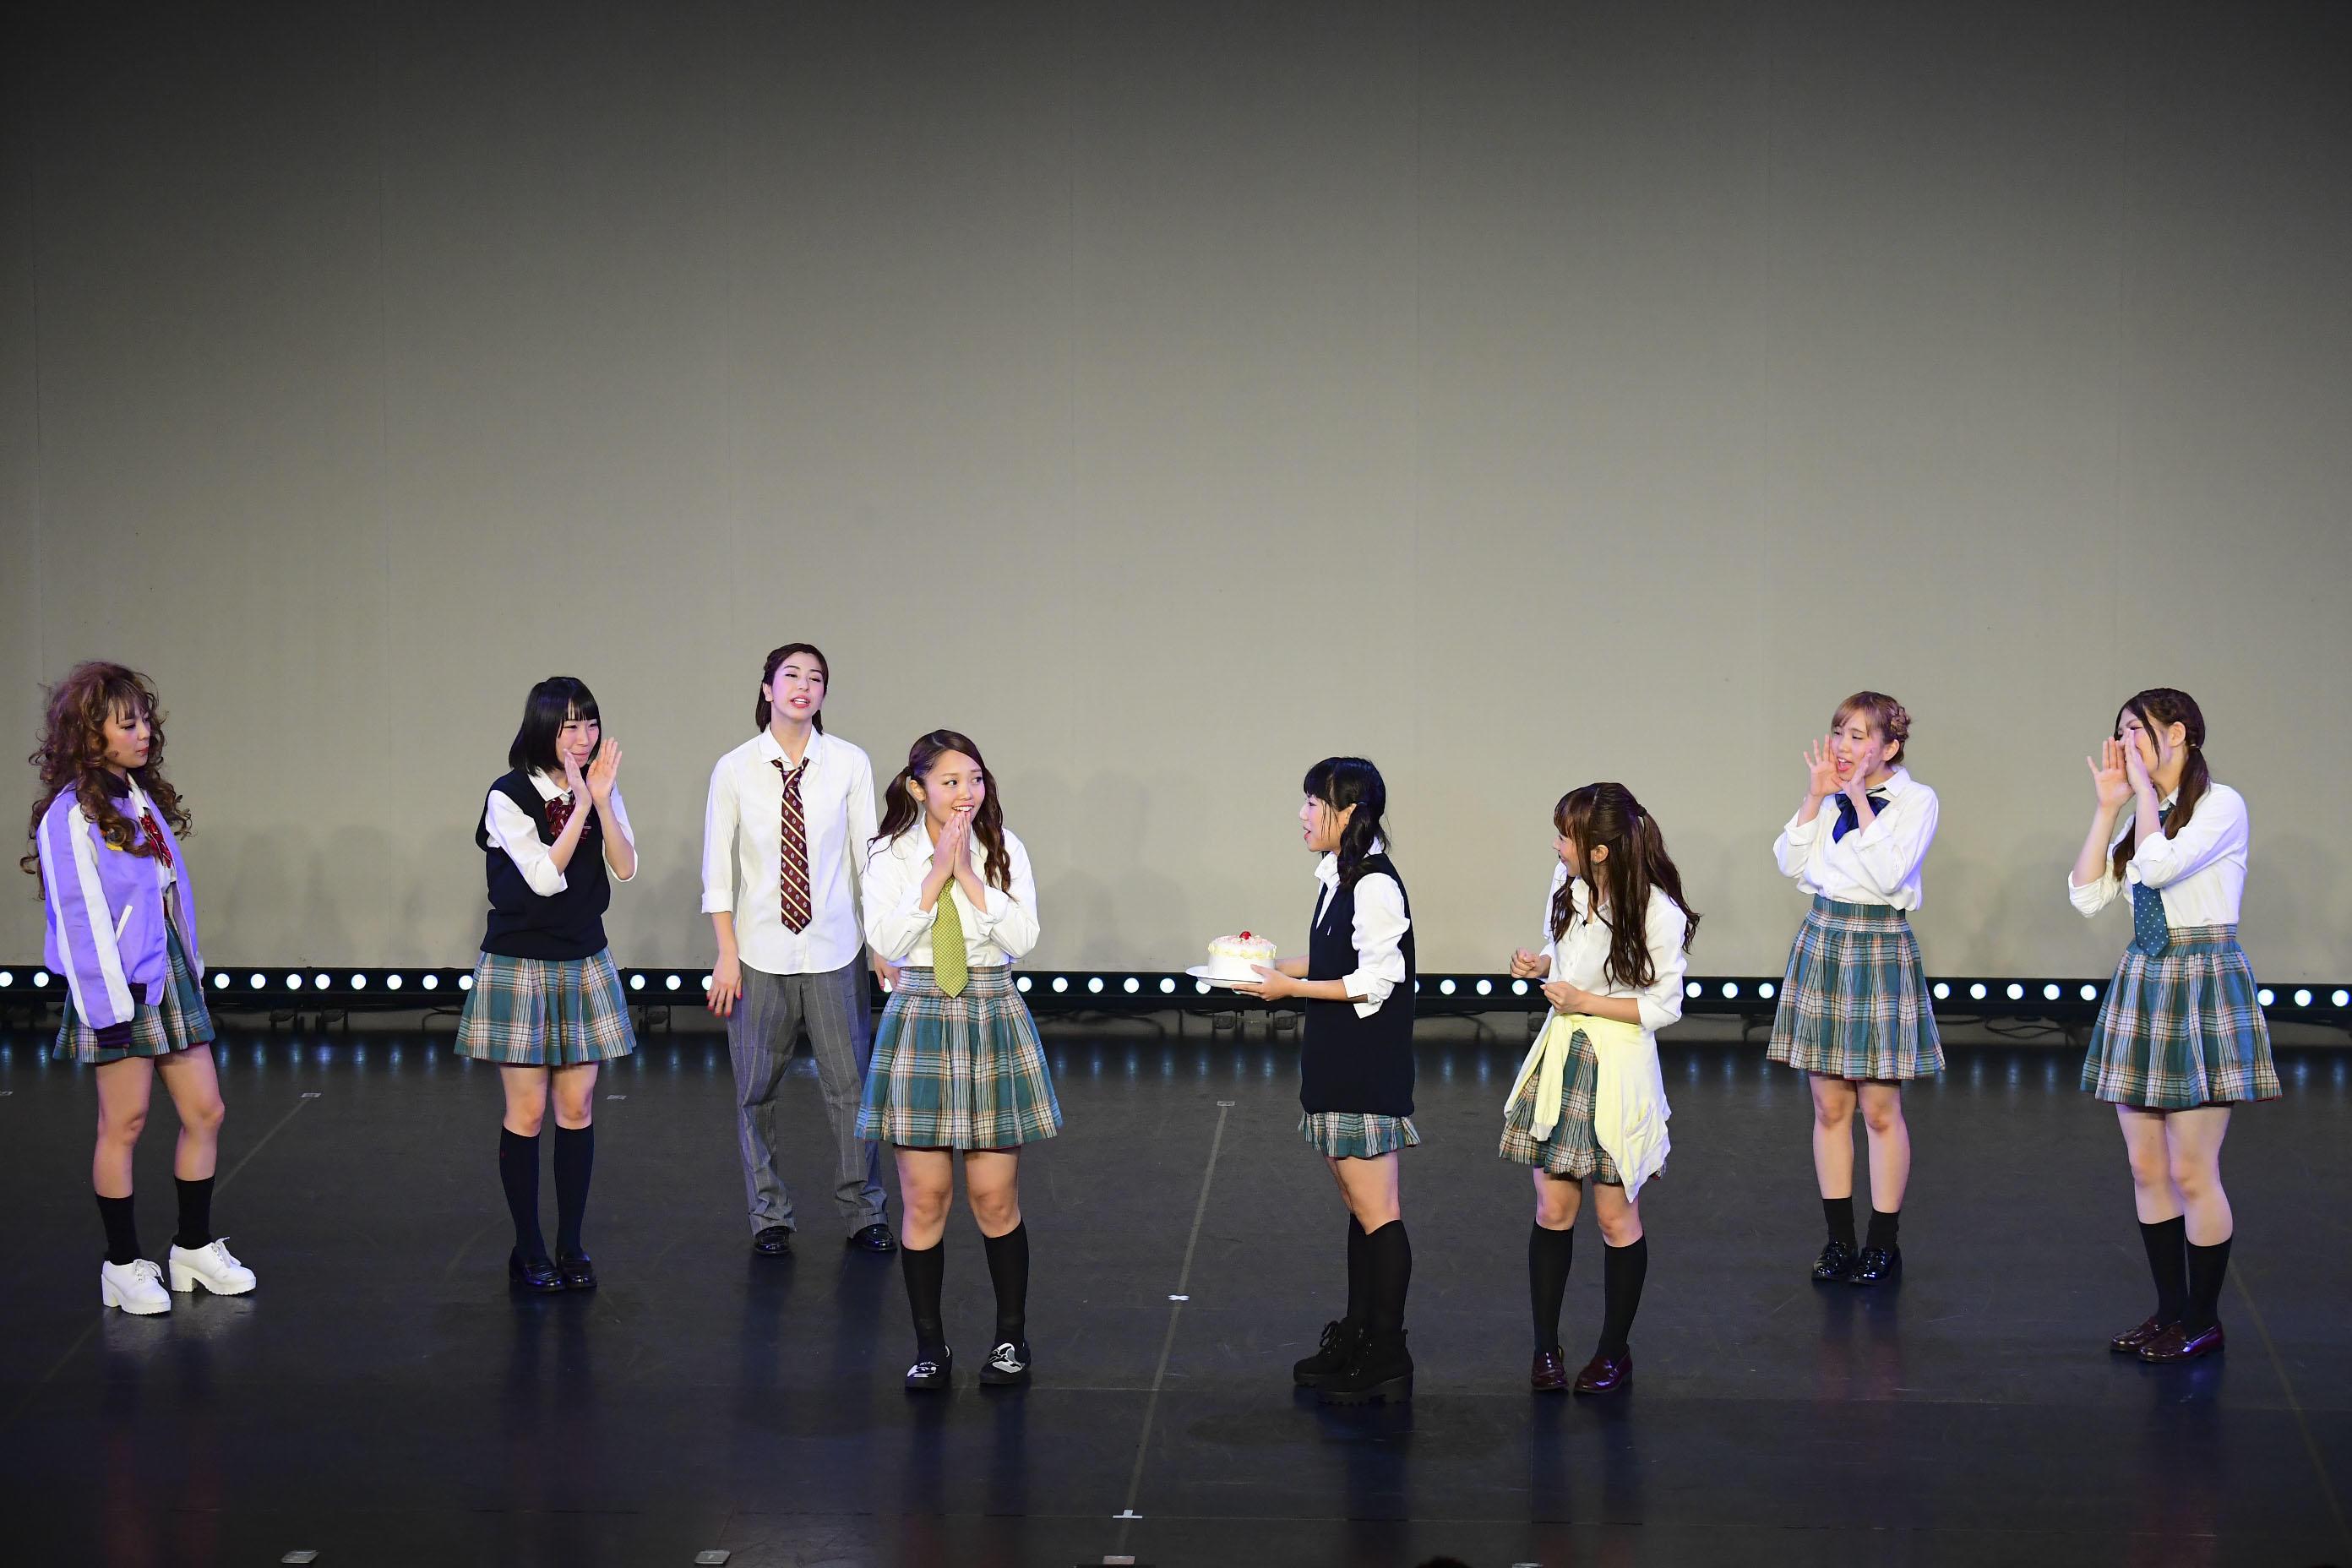 http://news.yoshimoto.co.jp/20170911121108-8018dfaa790f0517806e8e048f584d63484412ad.jpg